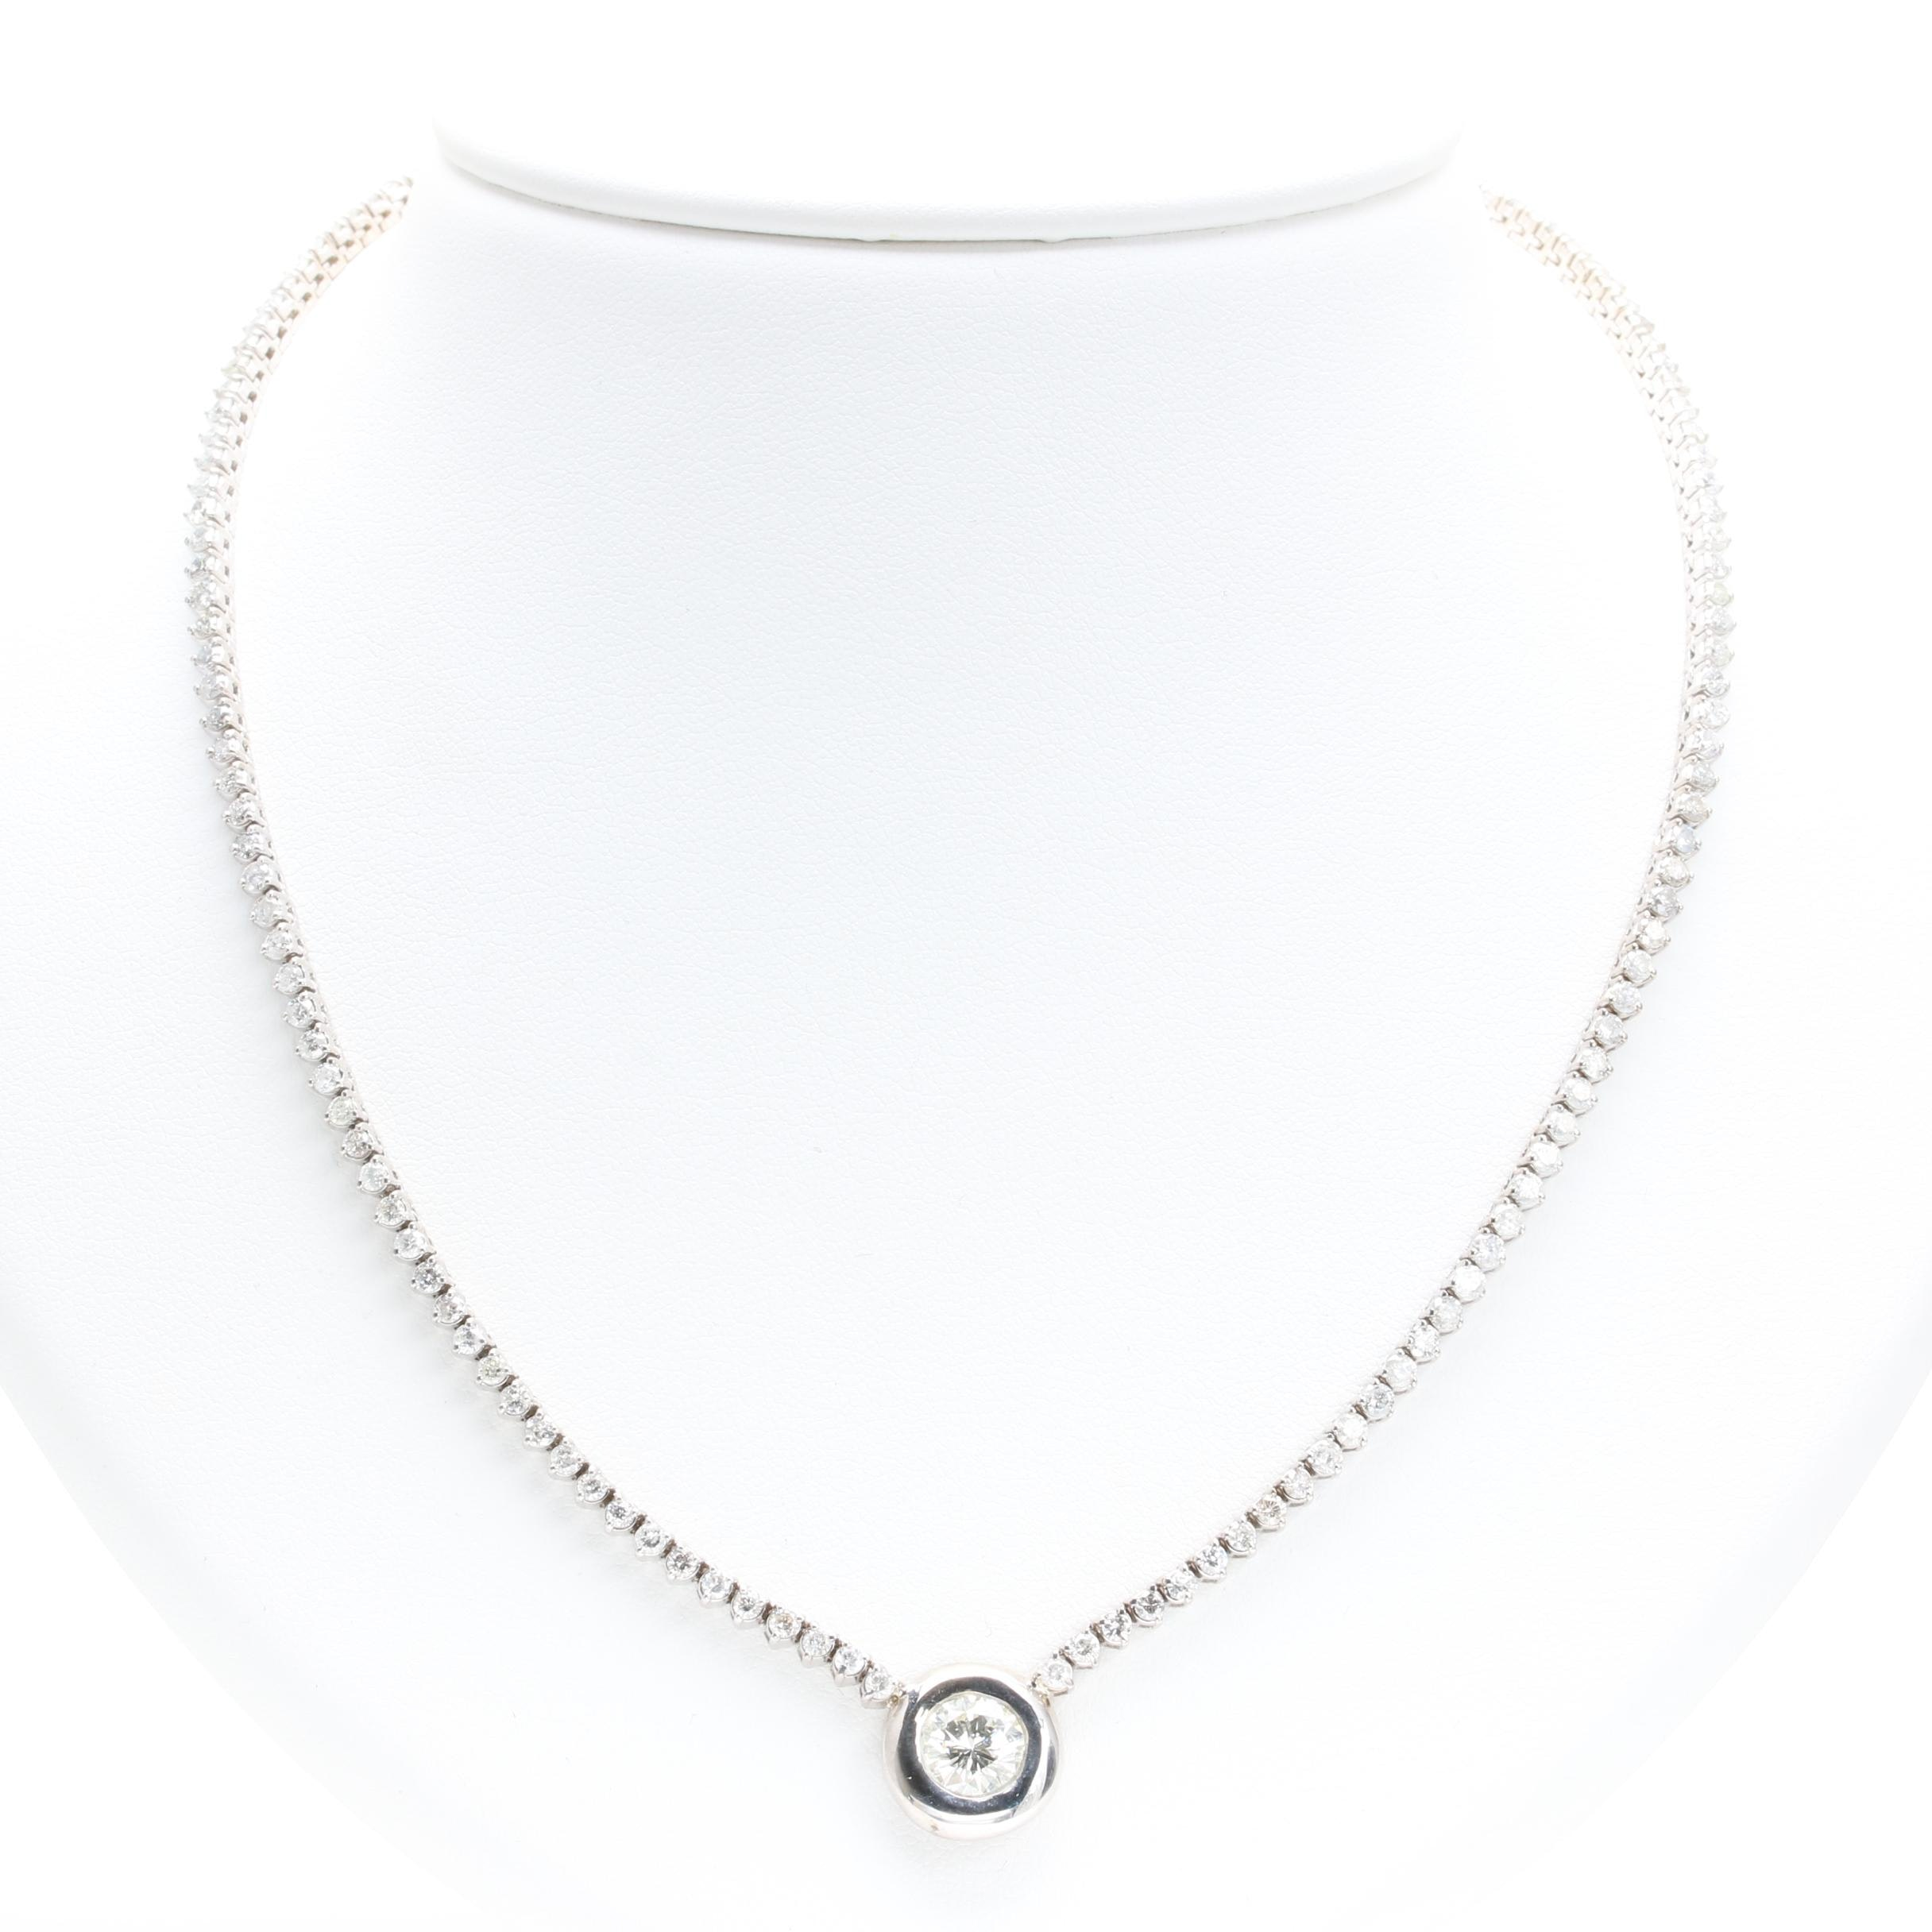 14K White Gold 6.40 CTW Diamond Necklace